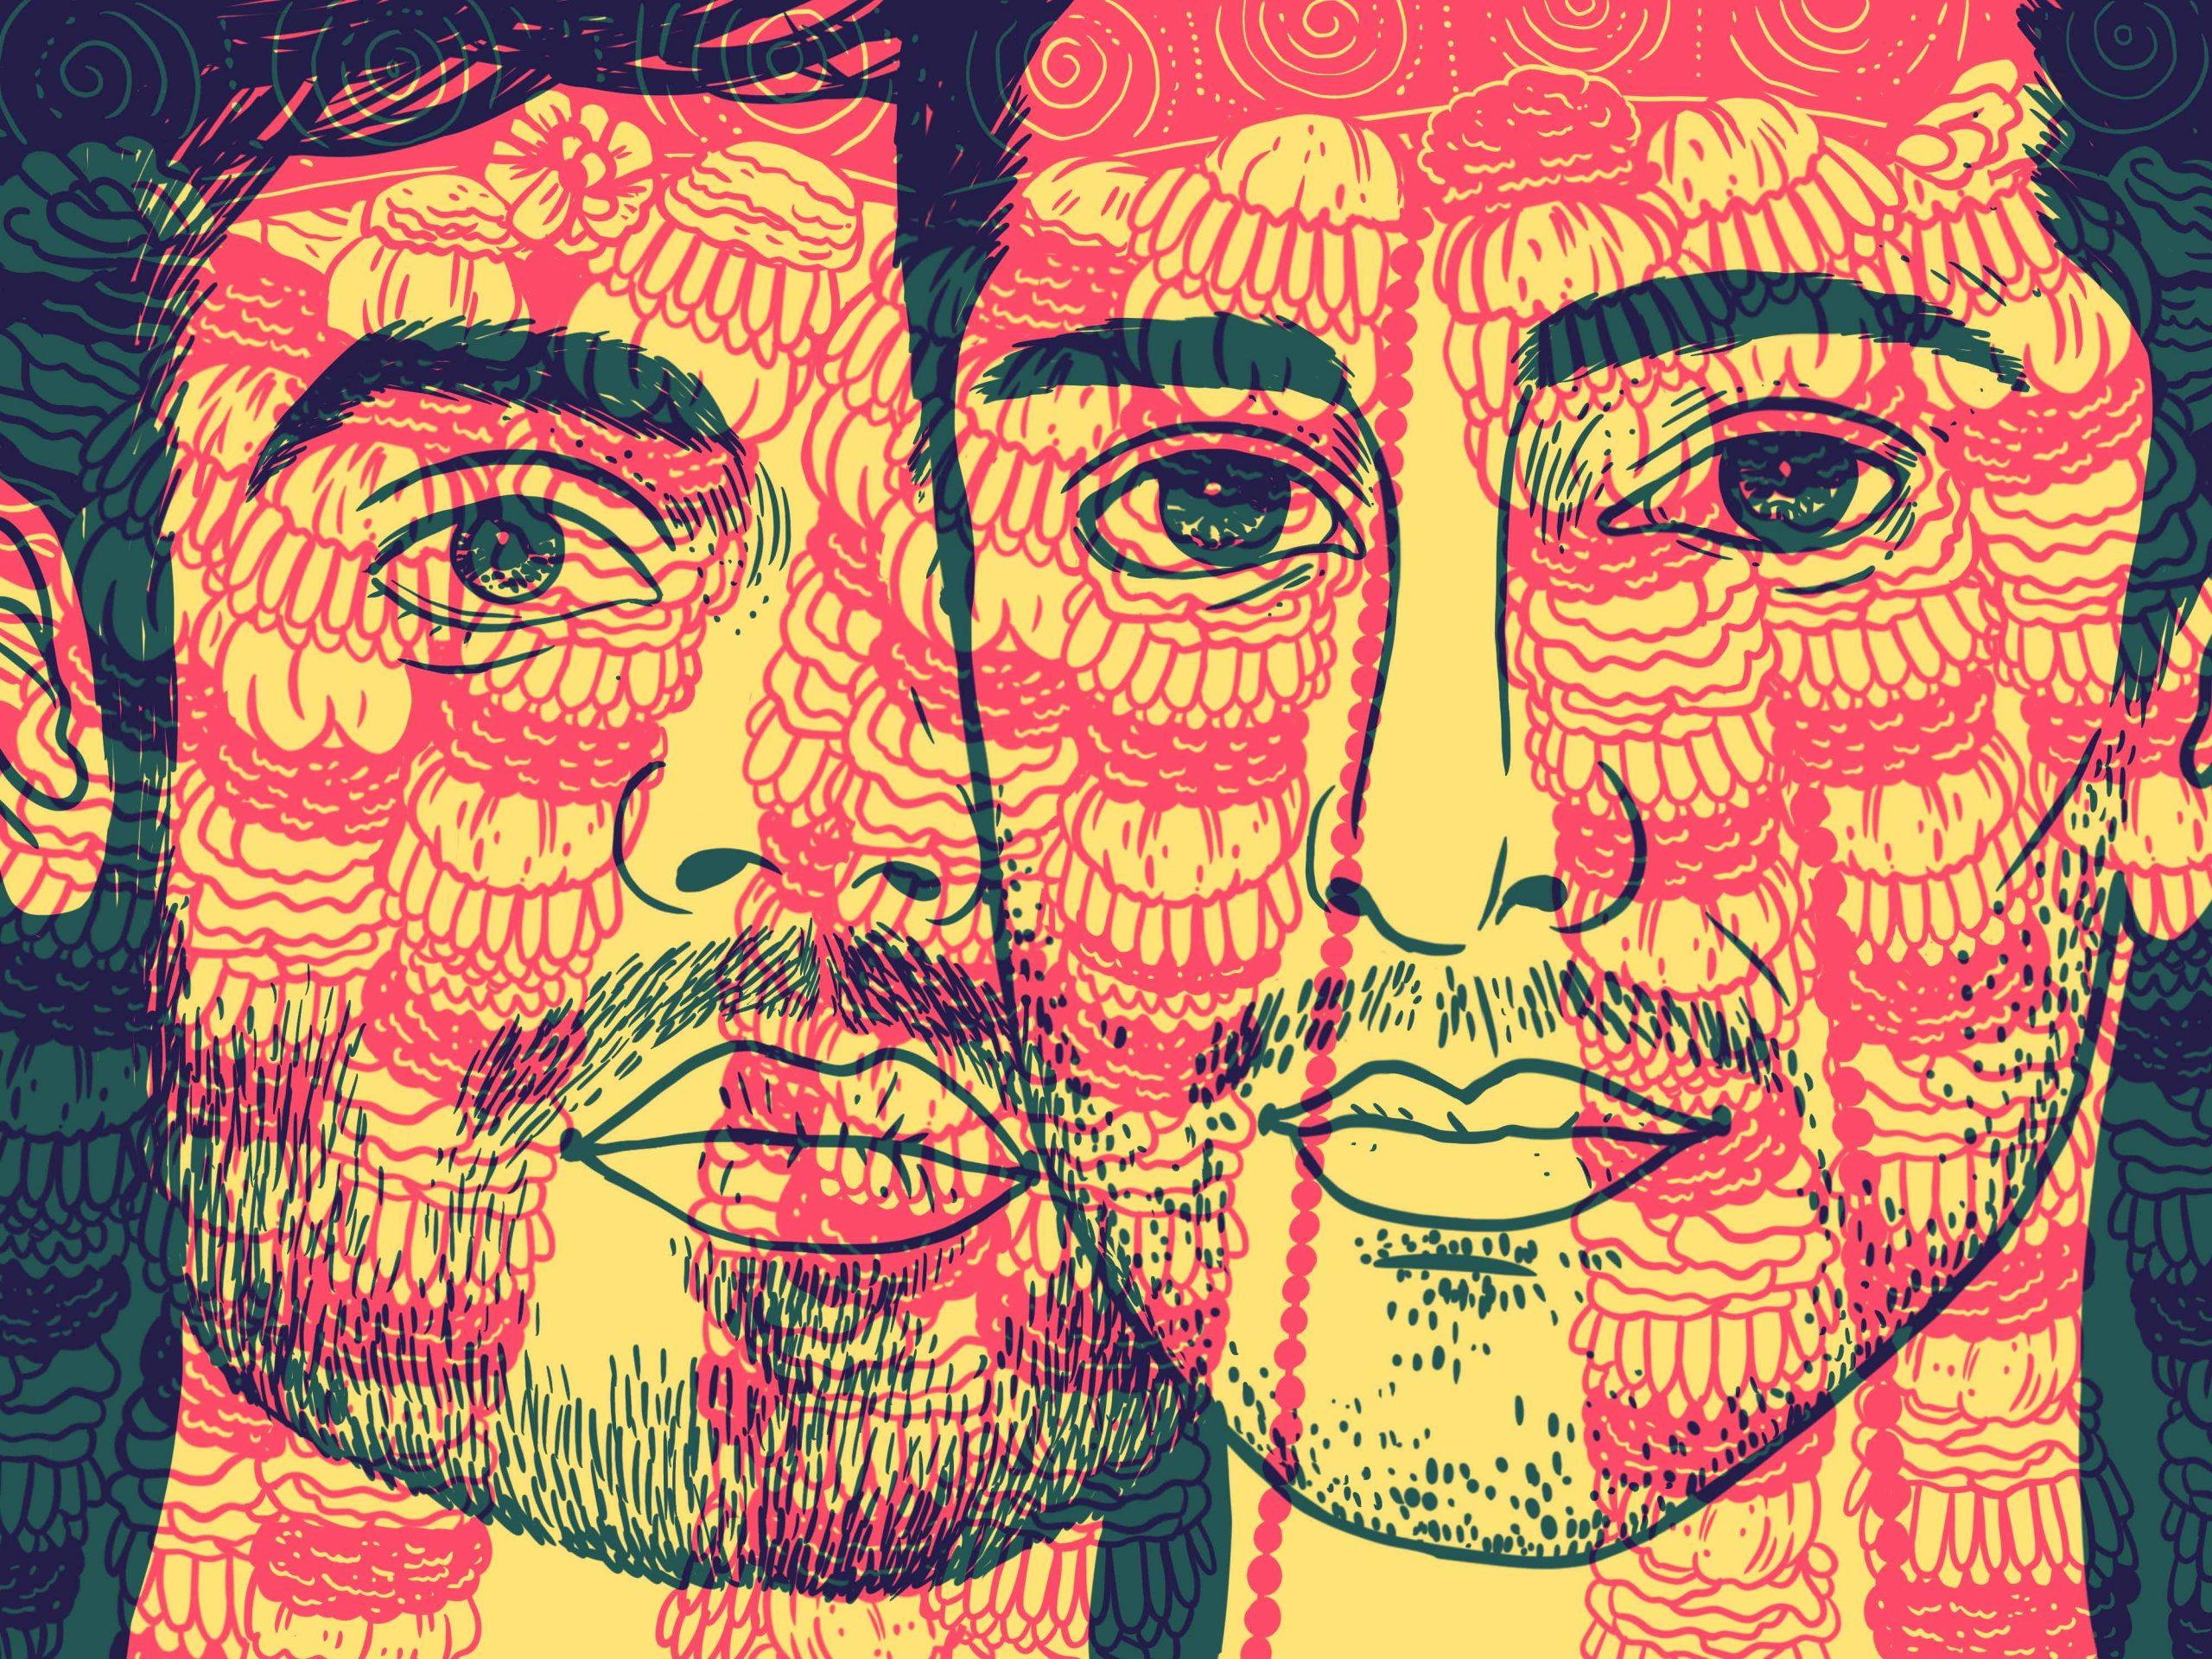 Riz Ahmed and Bassam Tariq on the personal journey of Mogul Mowgli